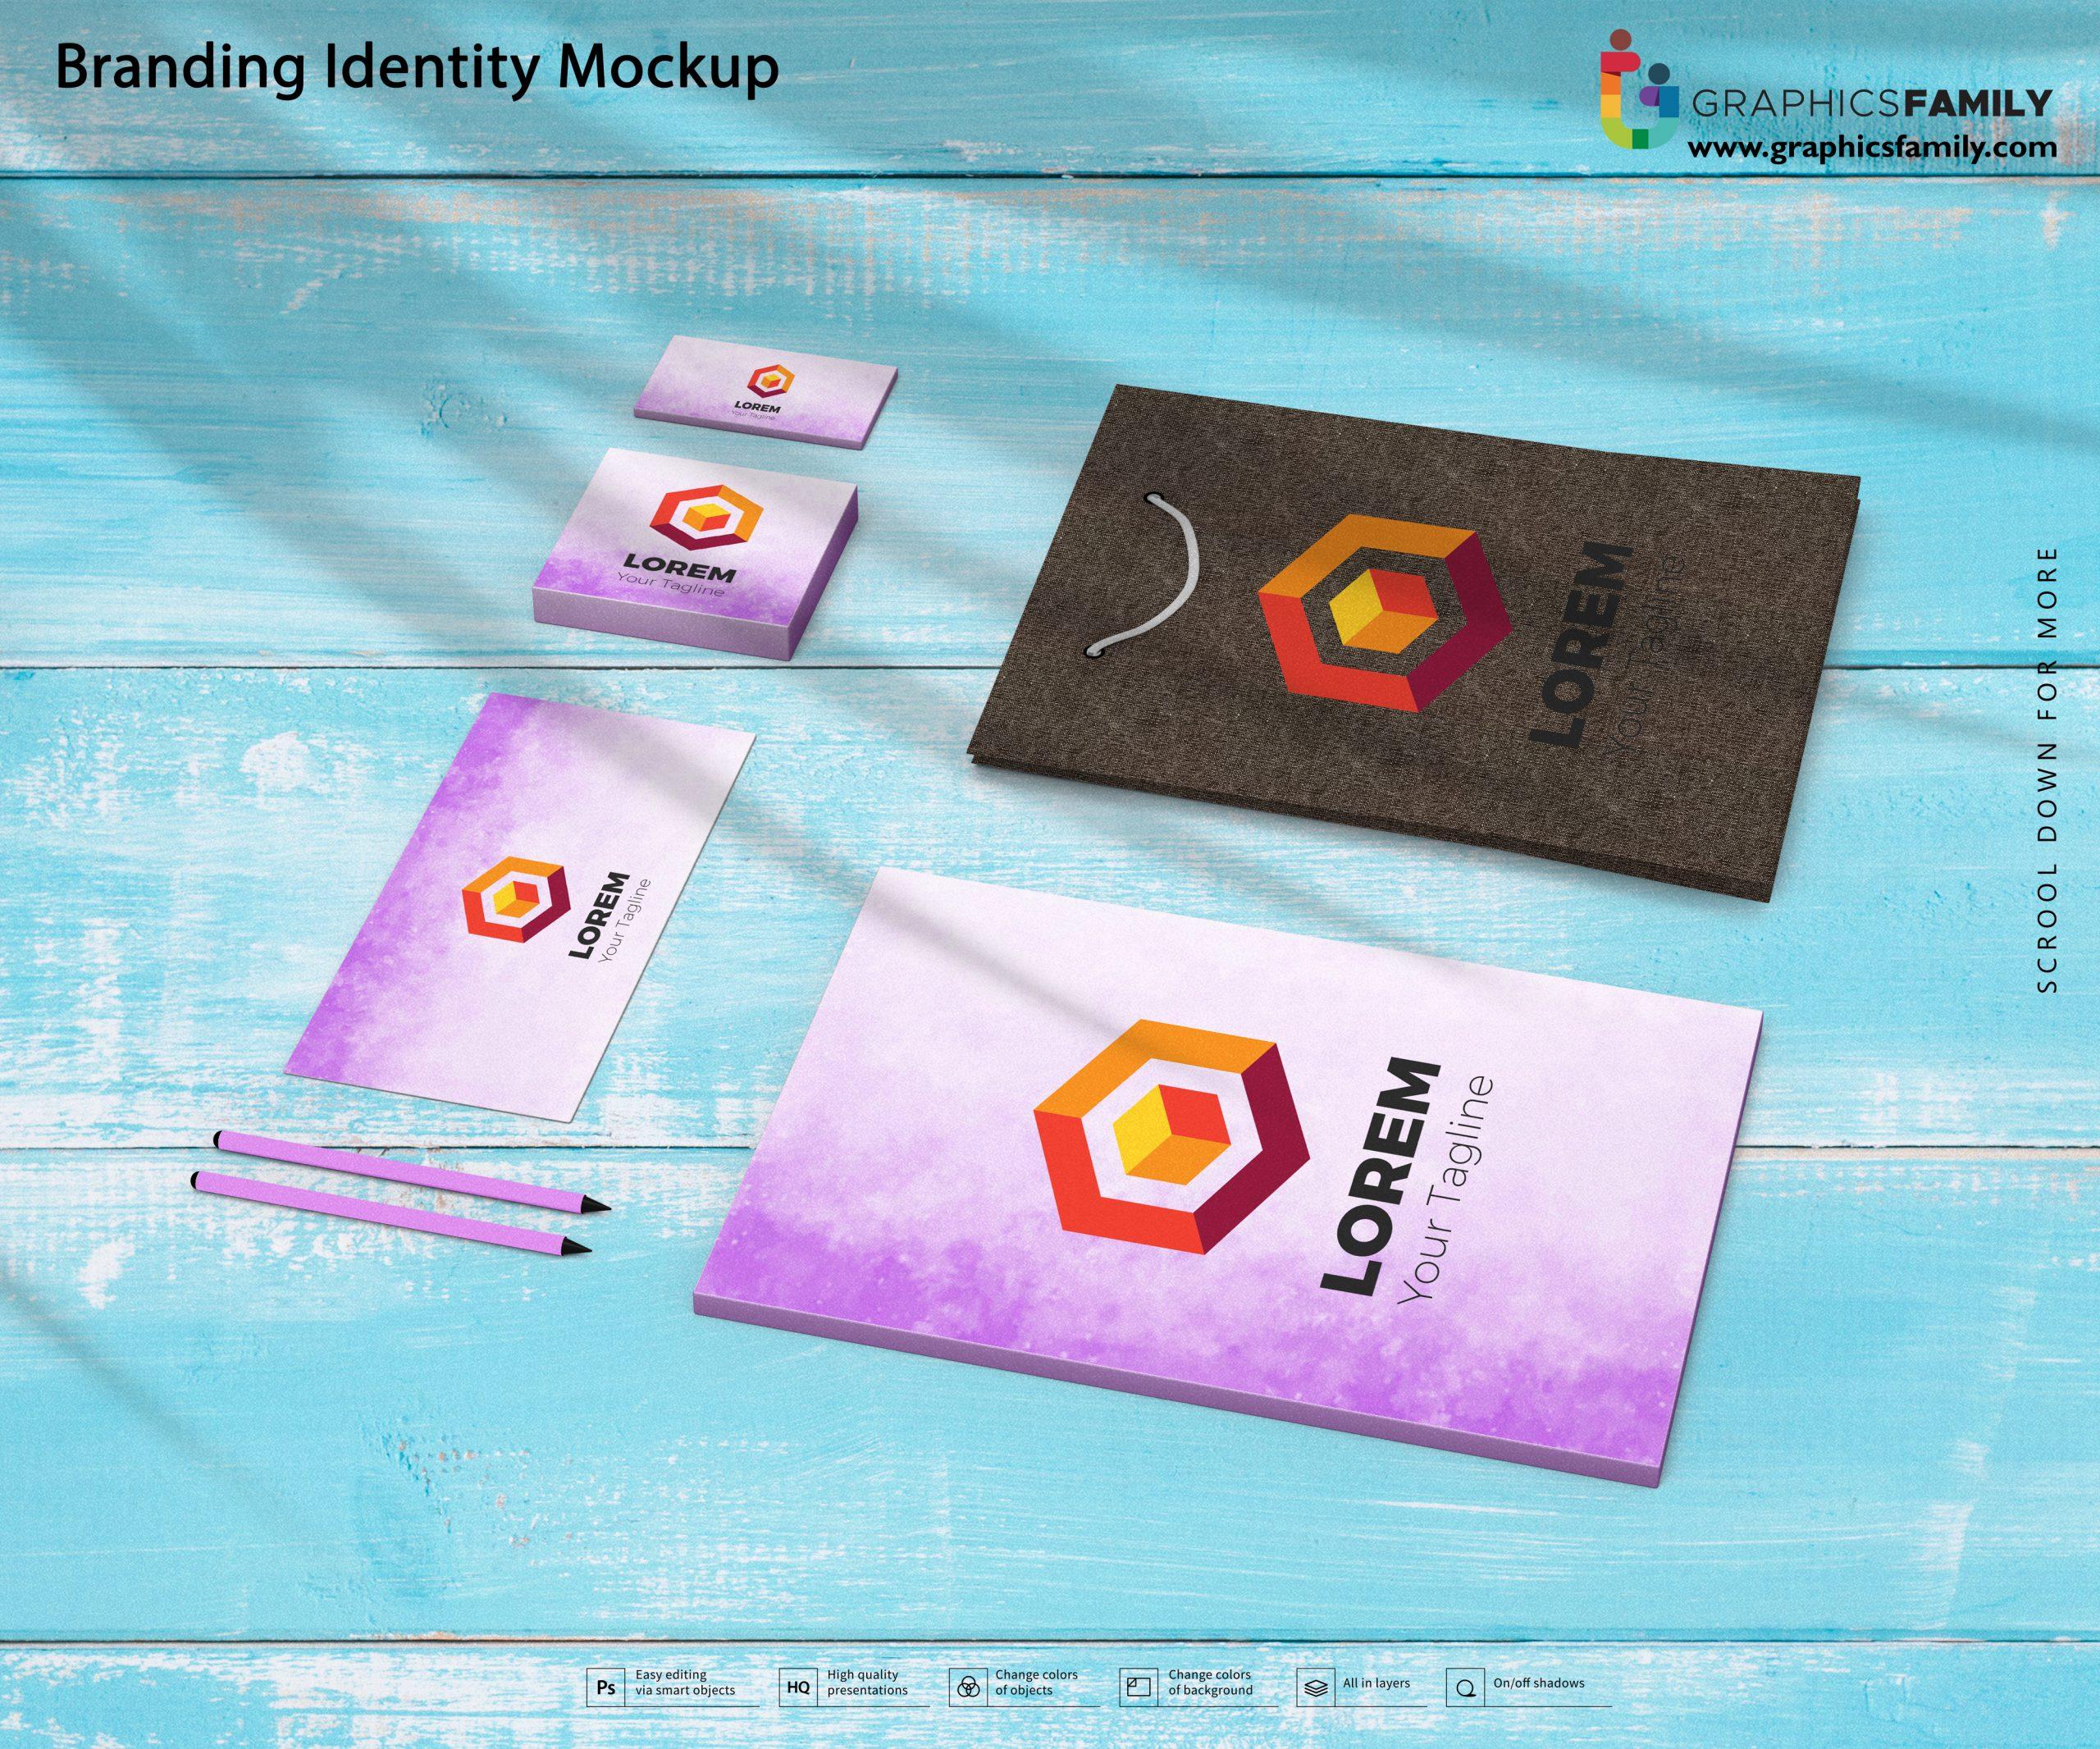 Free High-Quality Branding Identity Mockup PSD Download